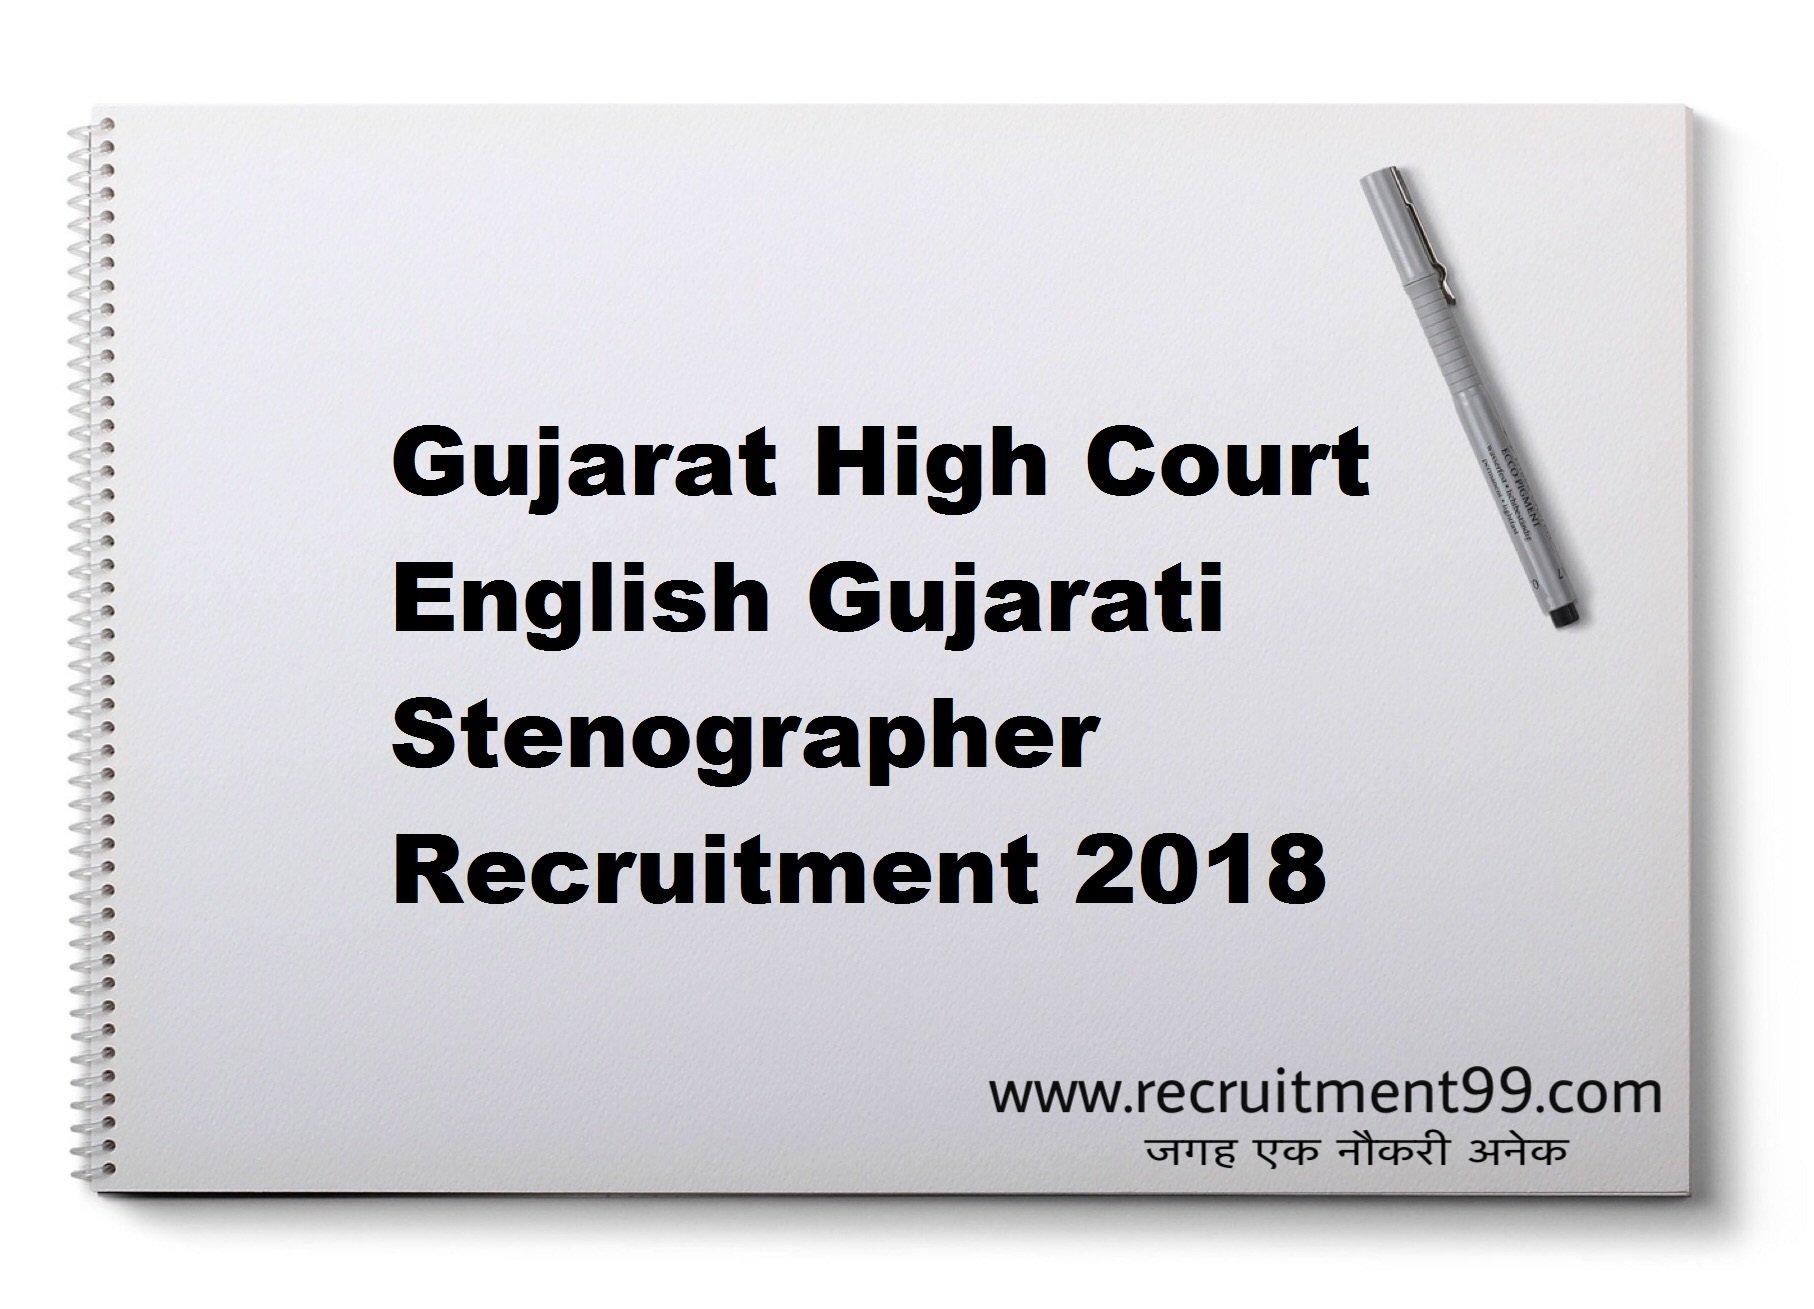 Gujarat High Court English Gujarati Stenographer Recruitment Admit Card Result 2018